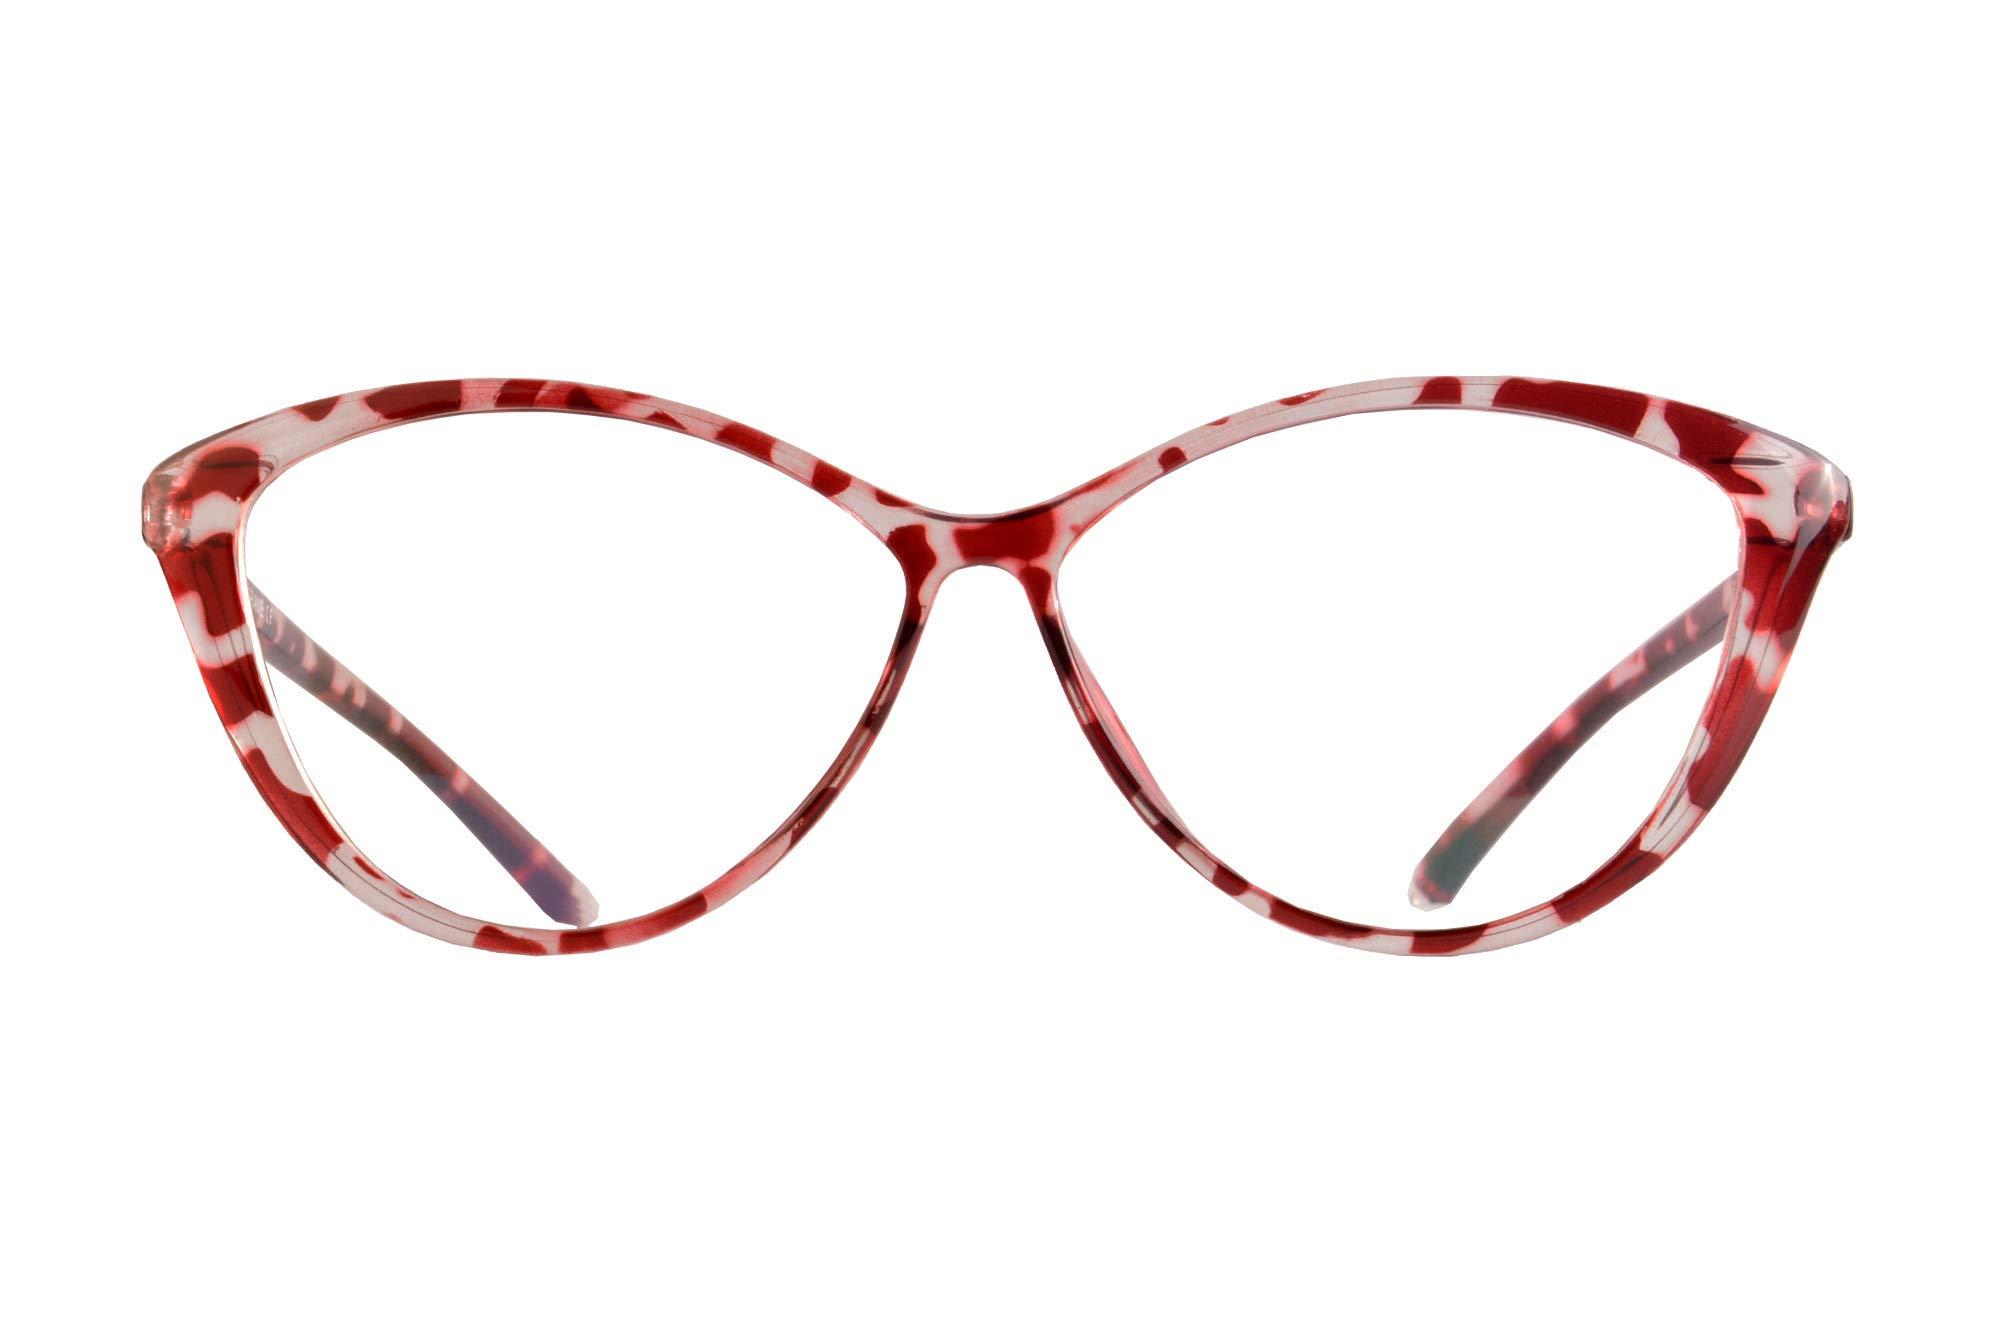 SHINU Women's Frame TR90 Customized Progressive Multifocus Computer Reading Glasses-M5865